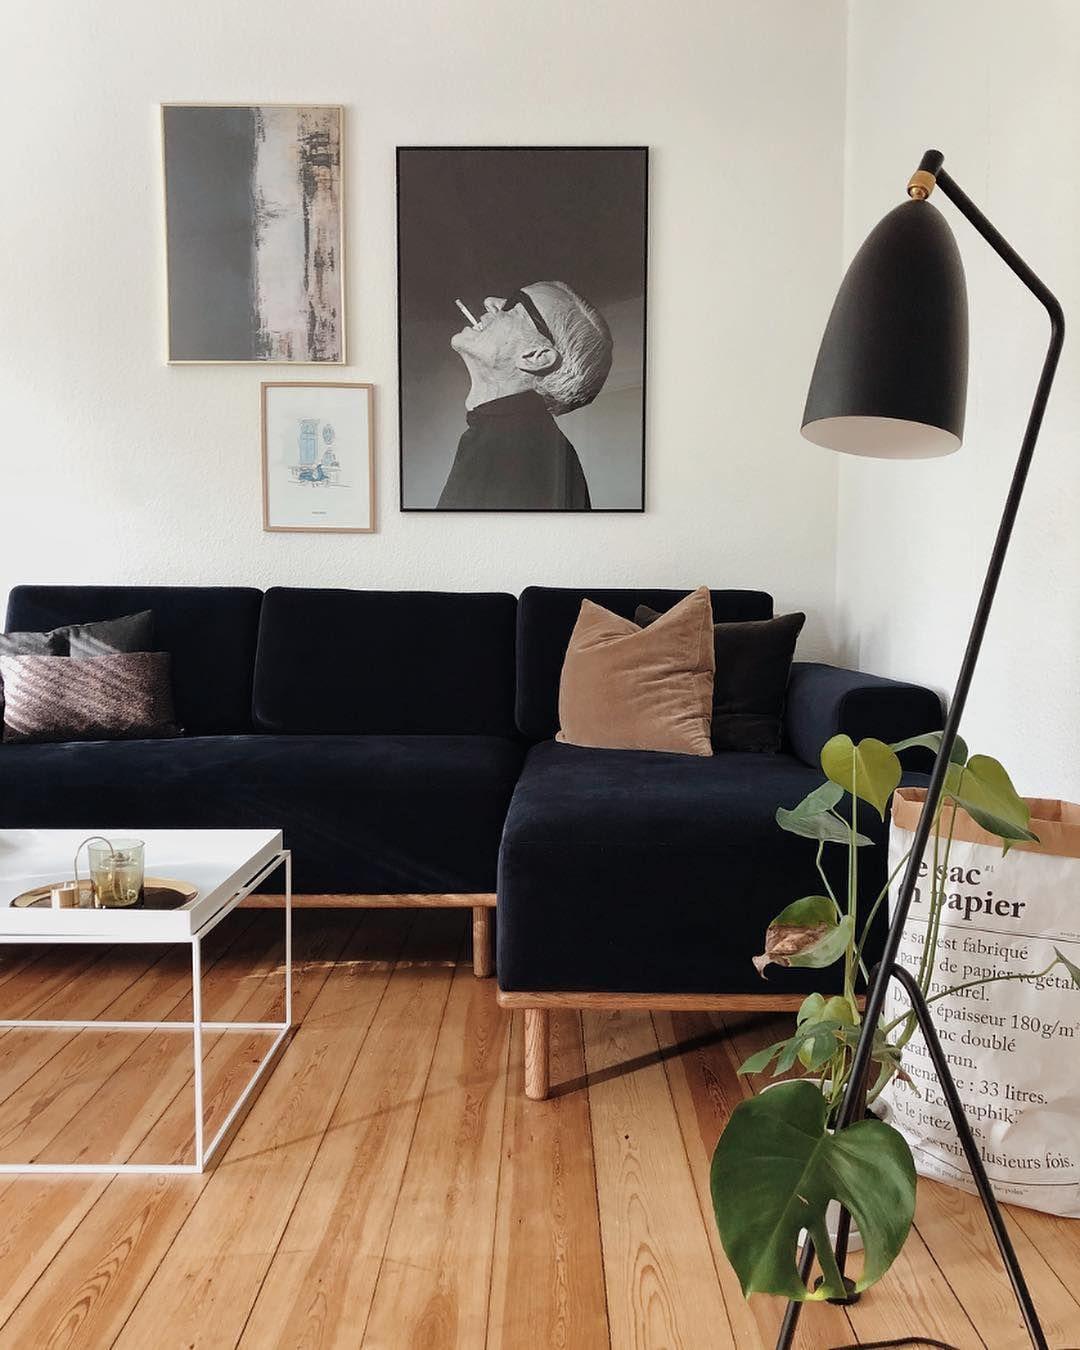 Sofakompagniet Brings Danish Design To The Heart Of The Home Danish Interior Design Danish Furniture Design Danish Design